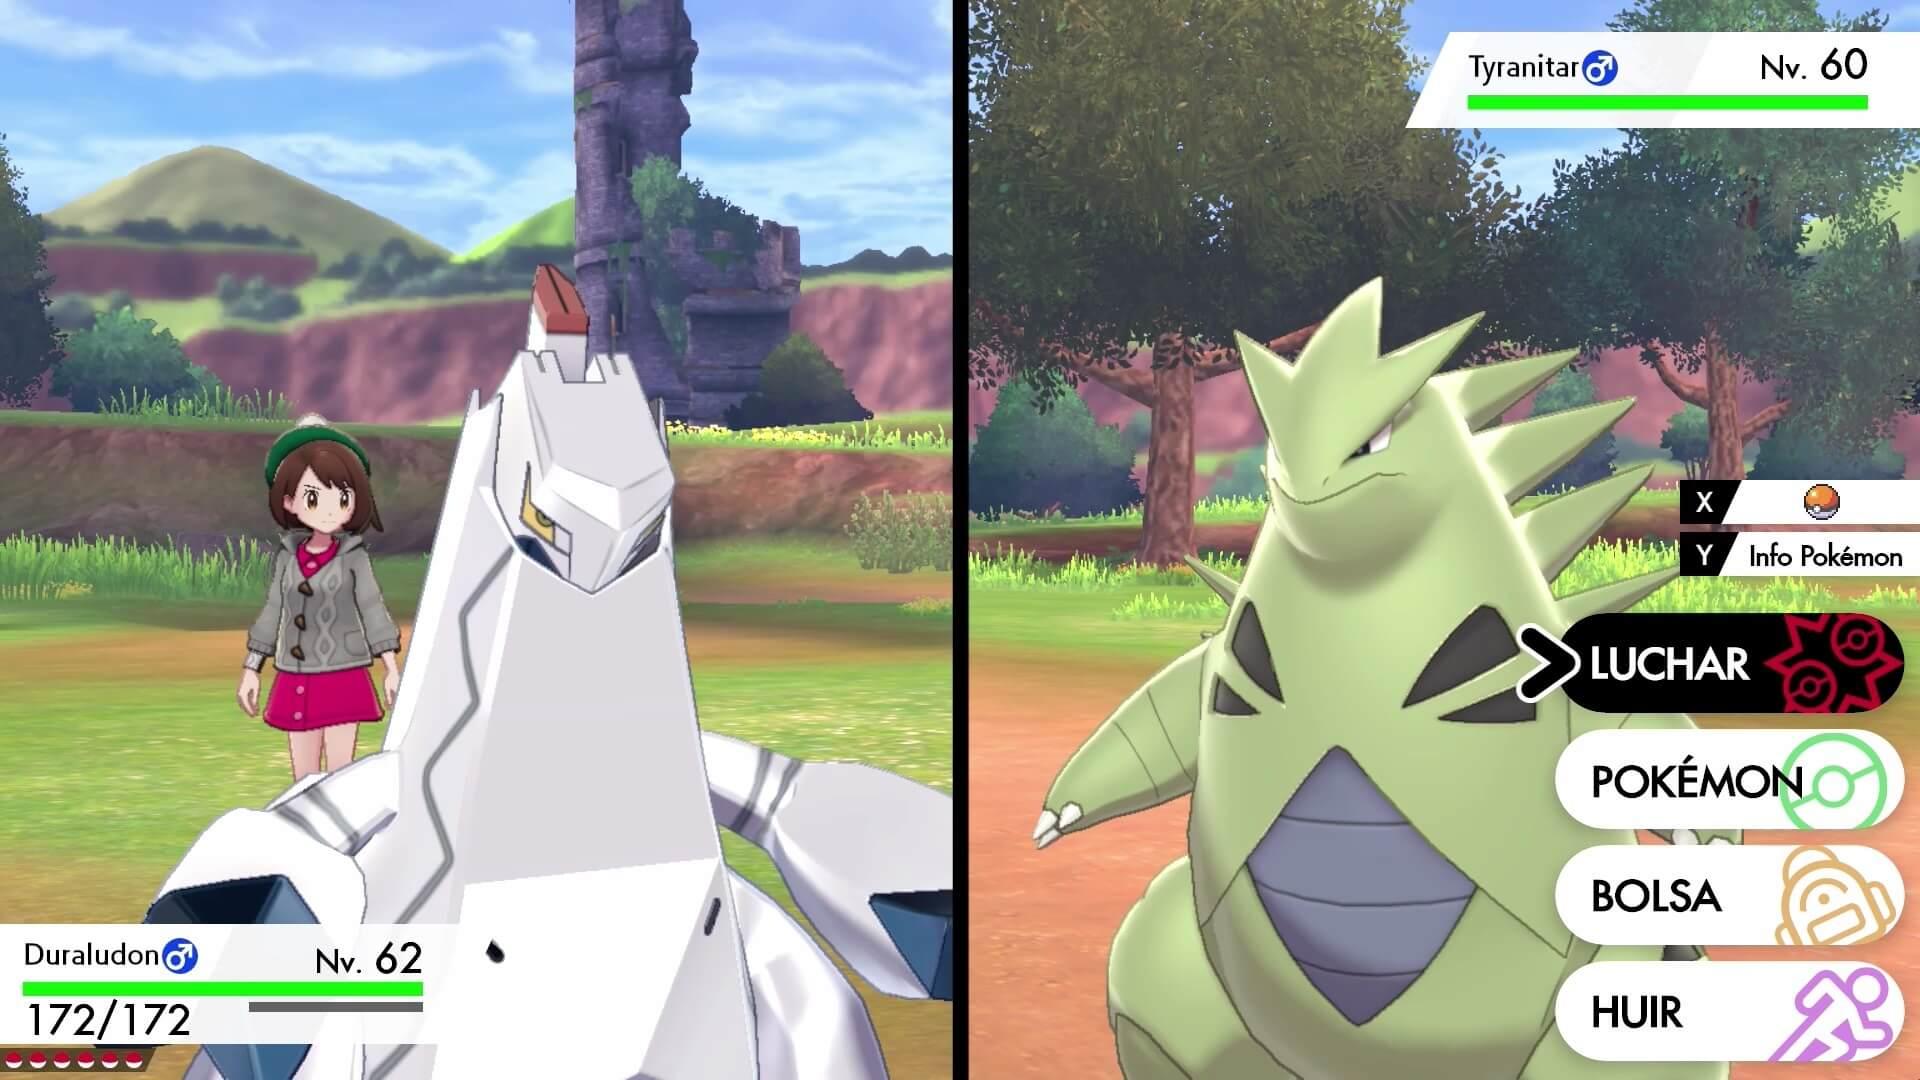 Pokémon Espada y Escudo Gigamax 14